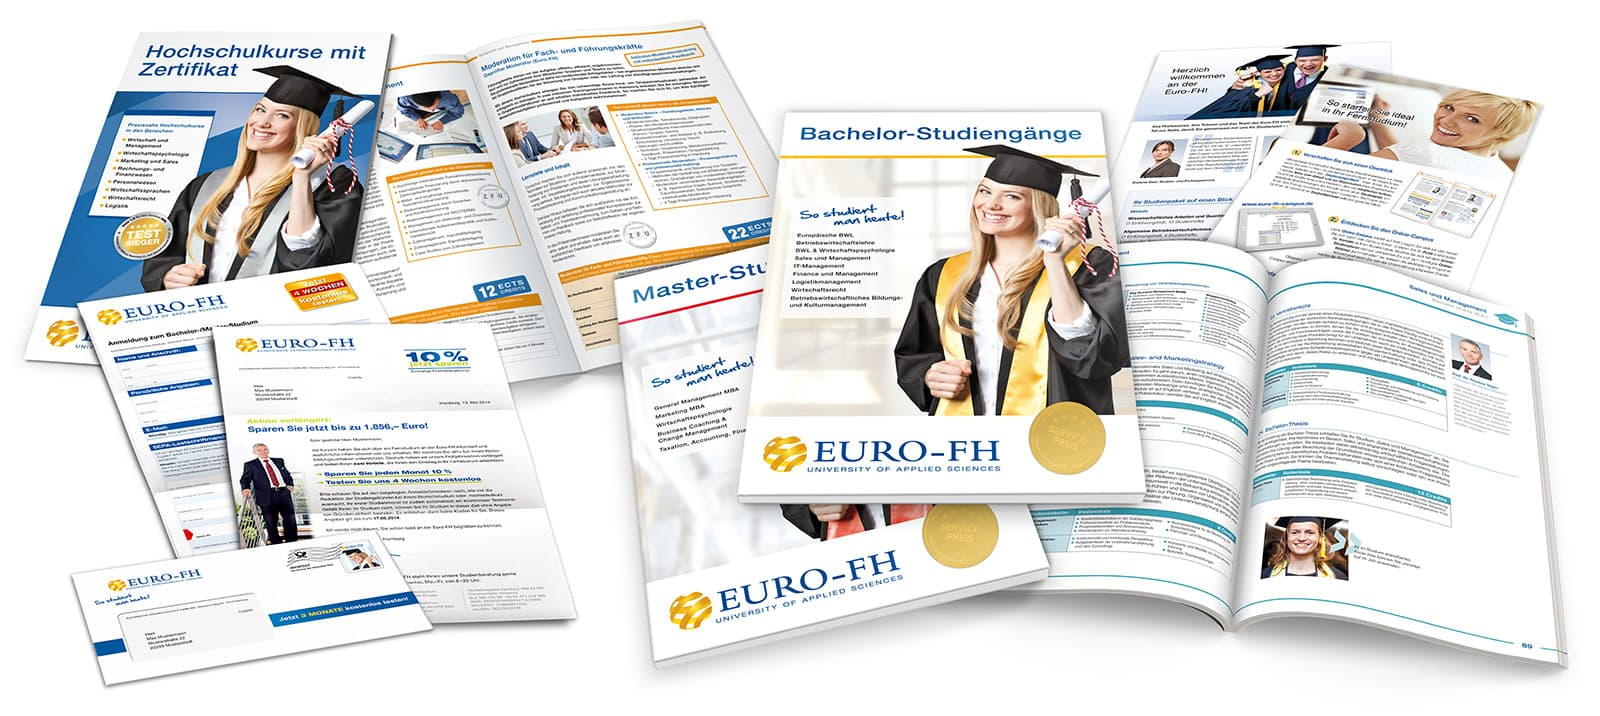 Euro-FH Printmaterialien bis 2018 Rückemänner Werbeagentur